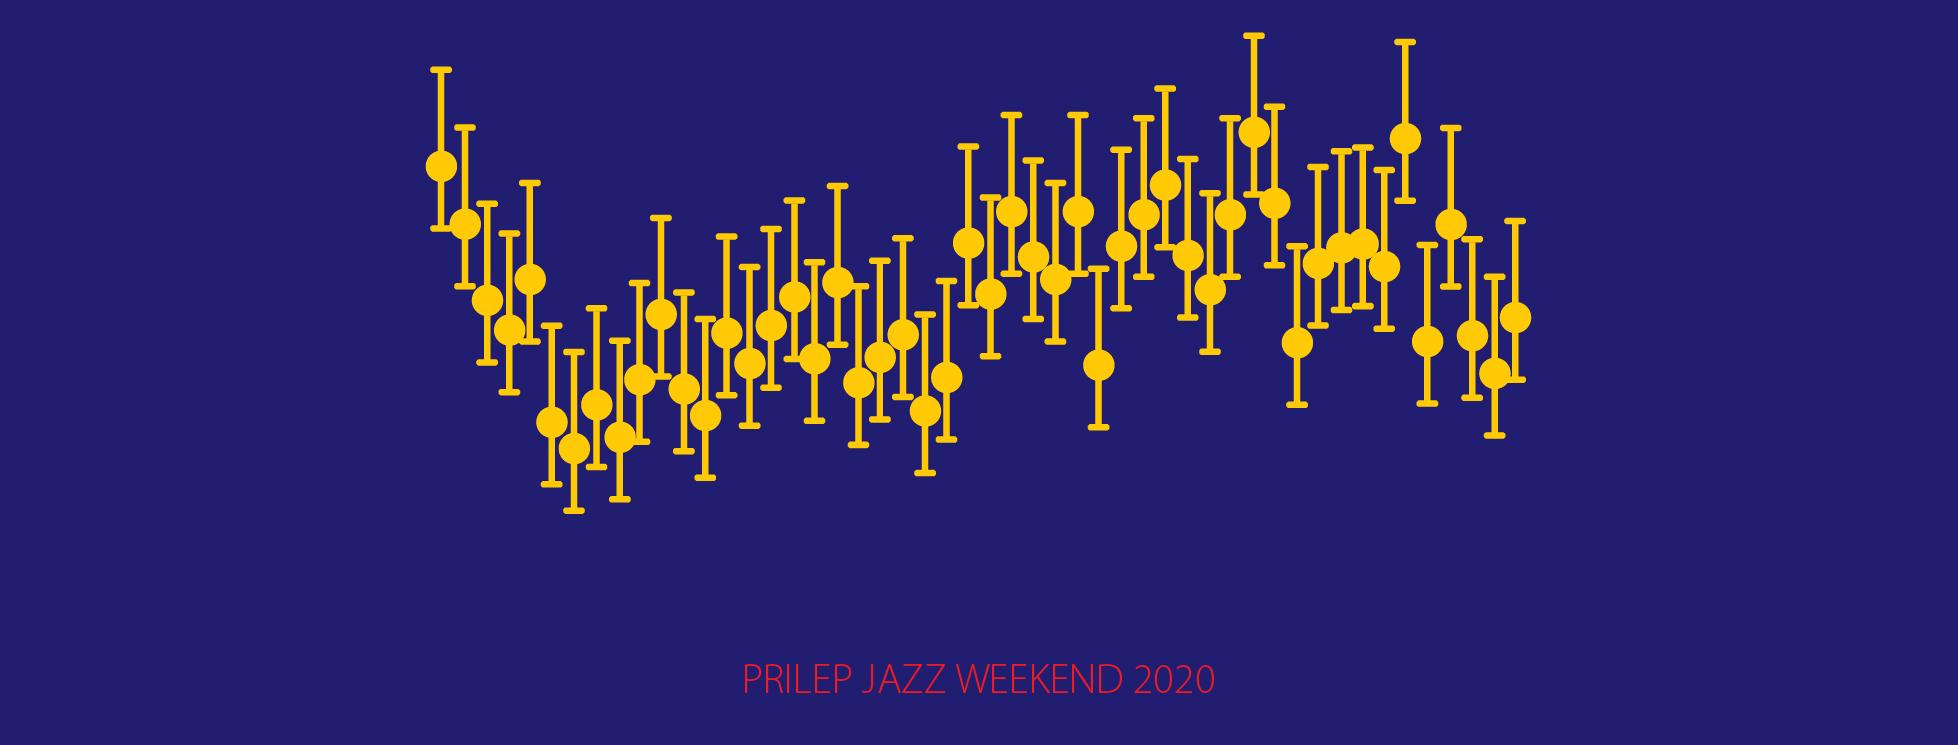 27.08.2020 - 29.08.2020 International Prilep Jazz Weekend